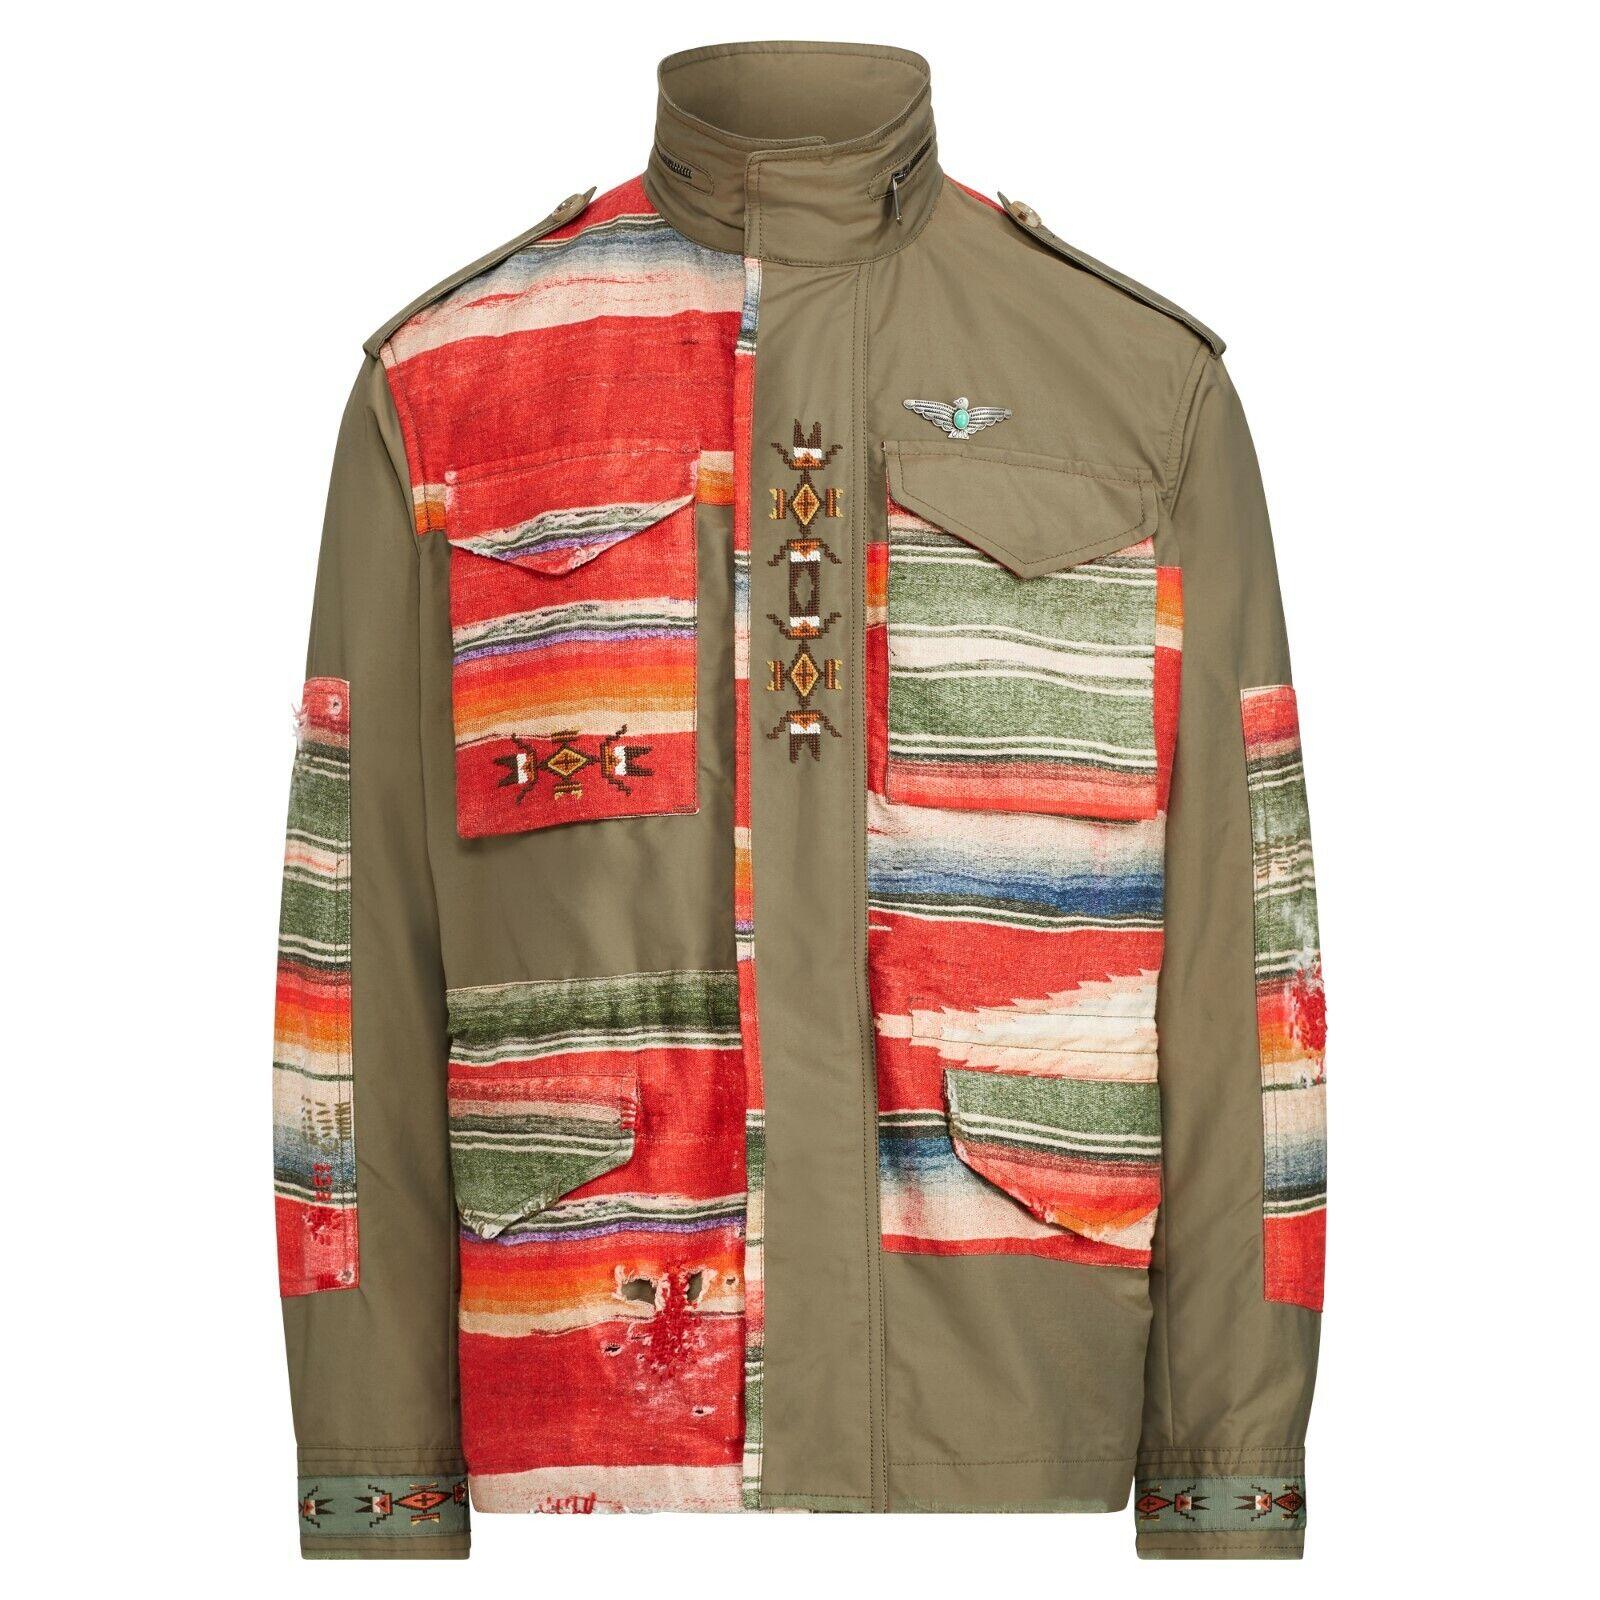 2495-polo-ralph-lauren-mens-southwestern-indian-aztec-field-jacket-italy-xl